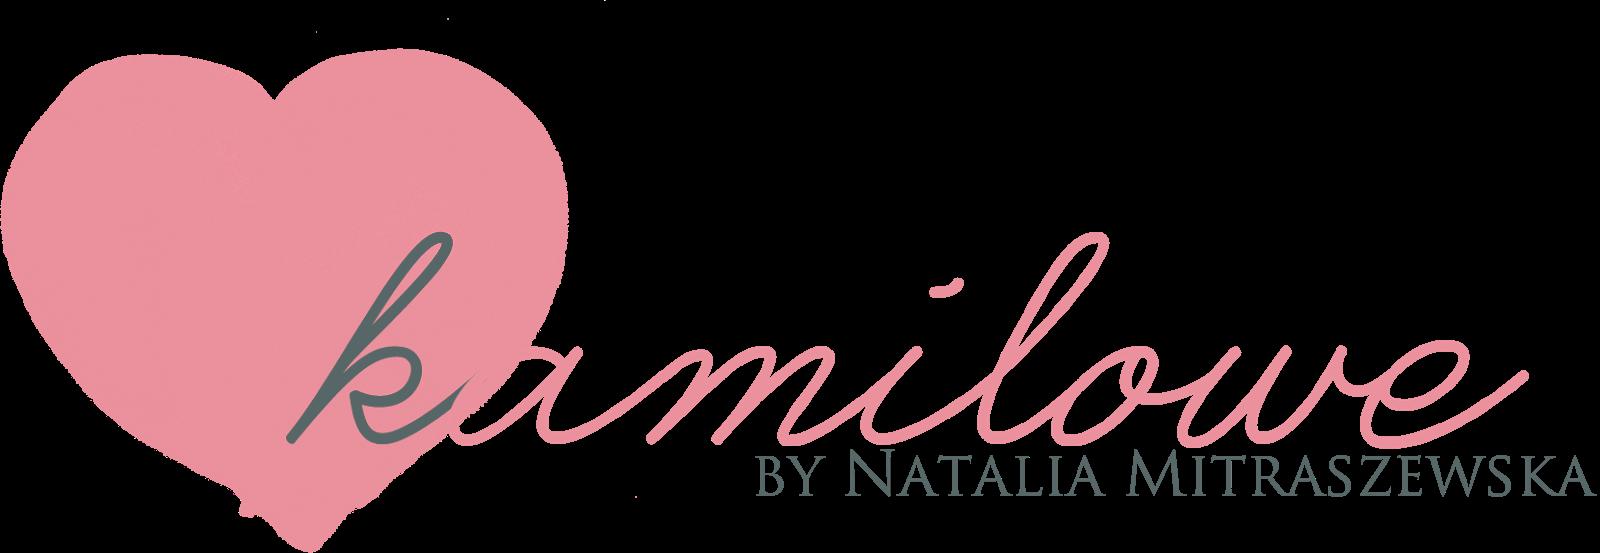 Kamilowe.pl | Parenting & Lifestyle